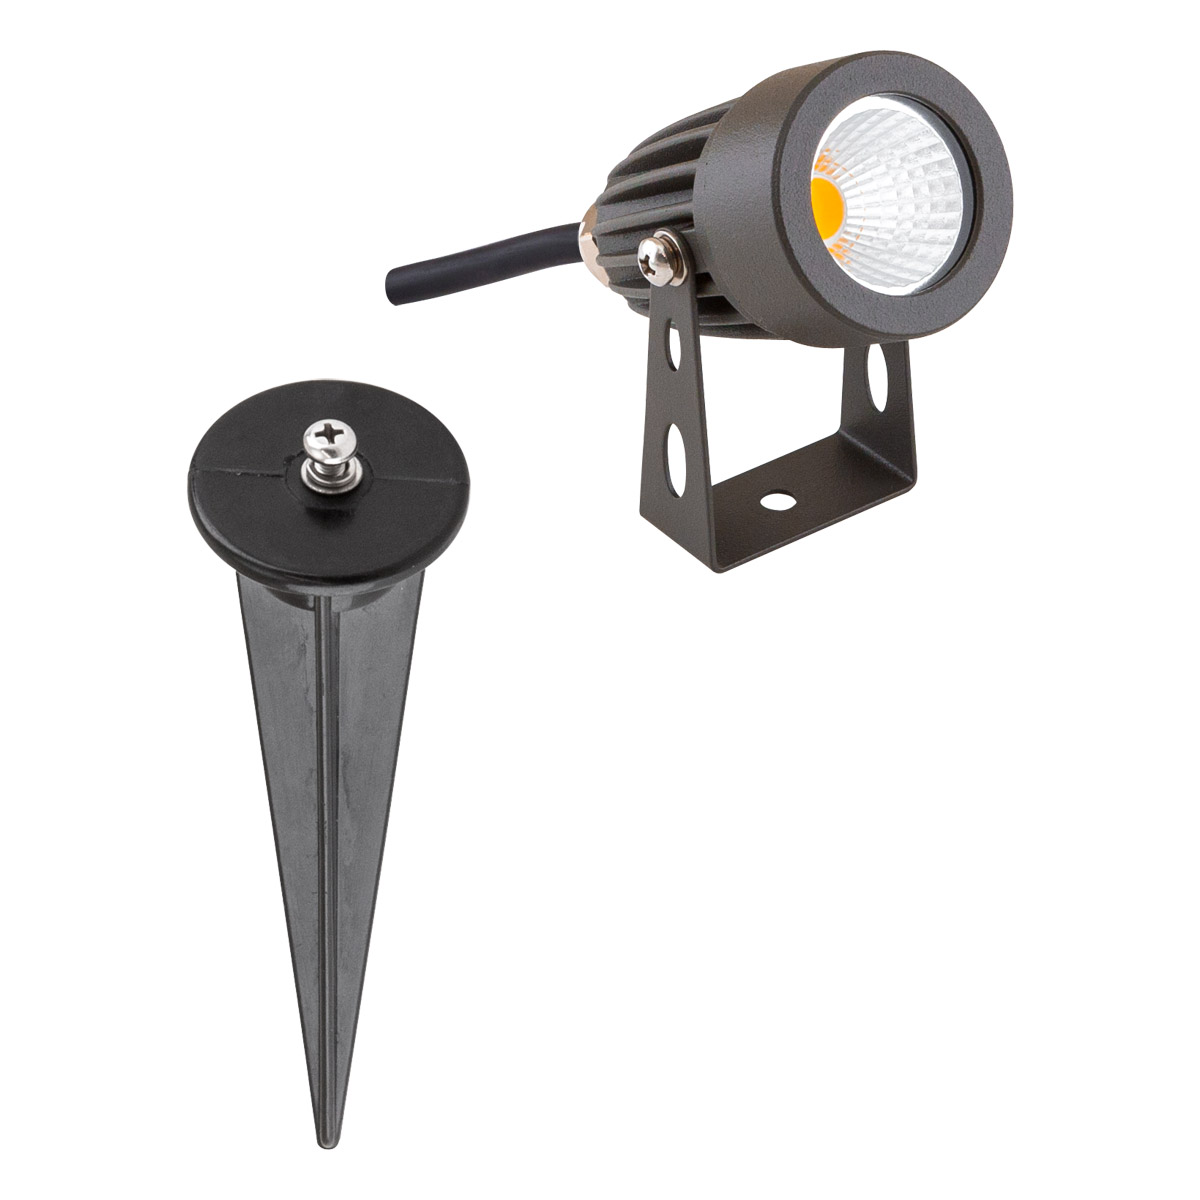 EVN Lichttechnik P-LED Spot eds PC680602 IP68 P-LED